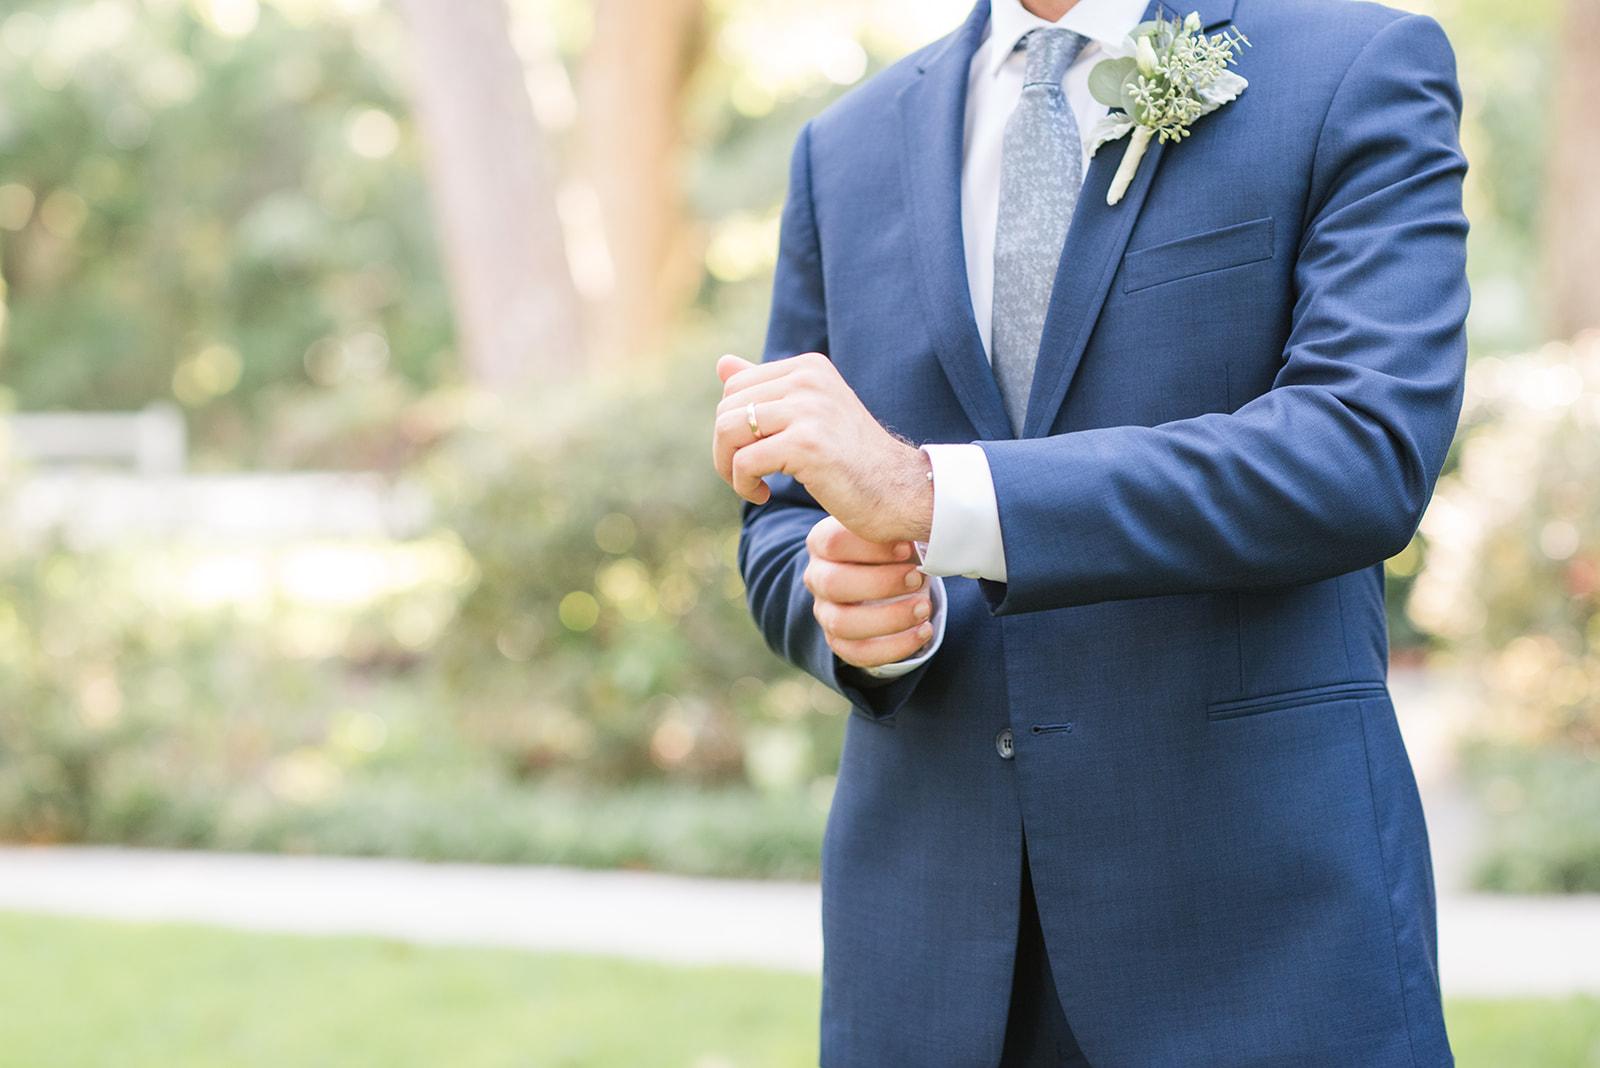 groom adjusts cufflink during Fairhope AL destination wedding photos